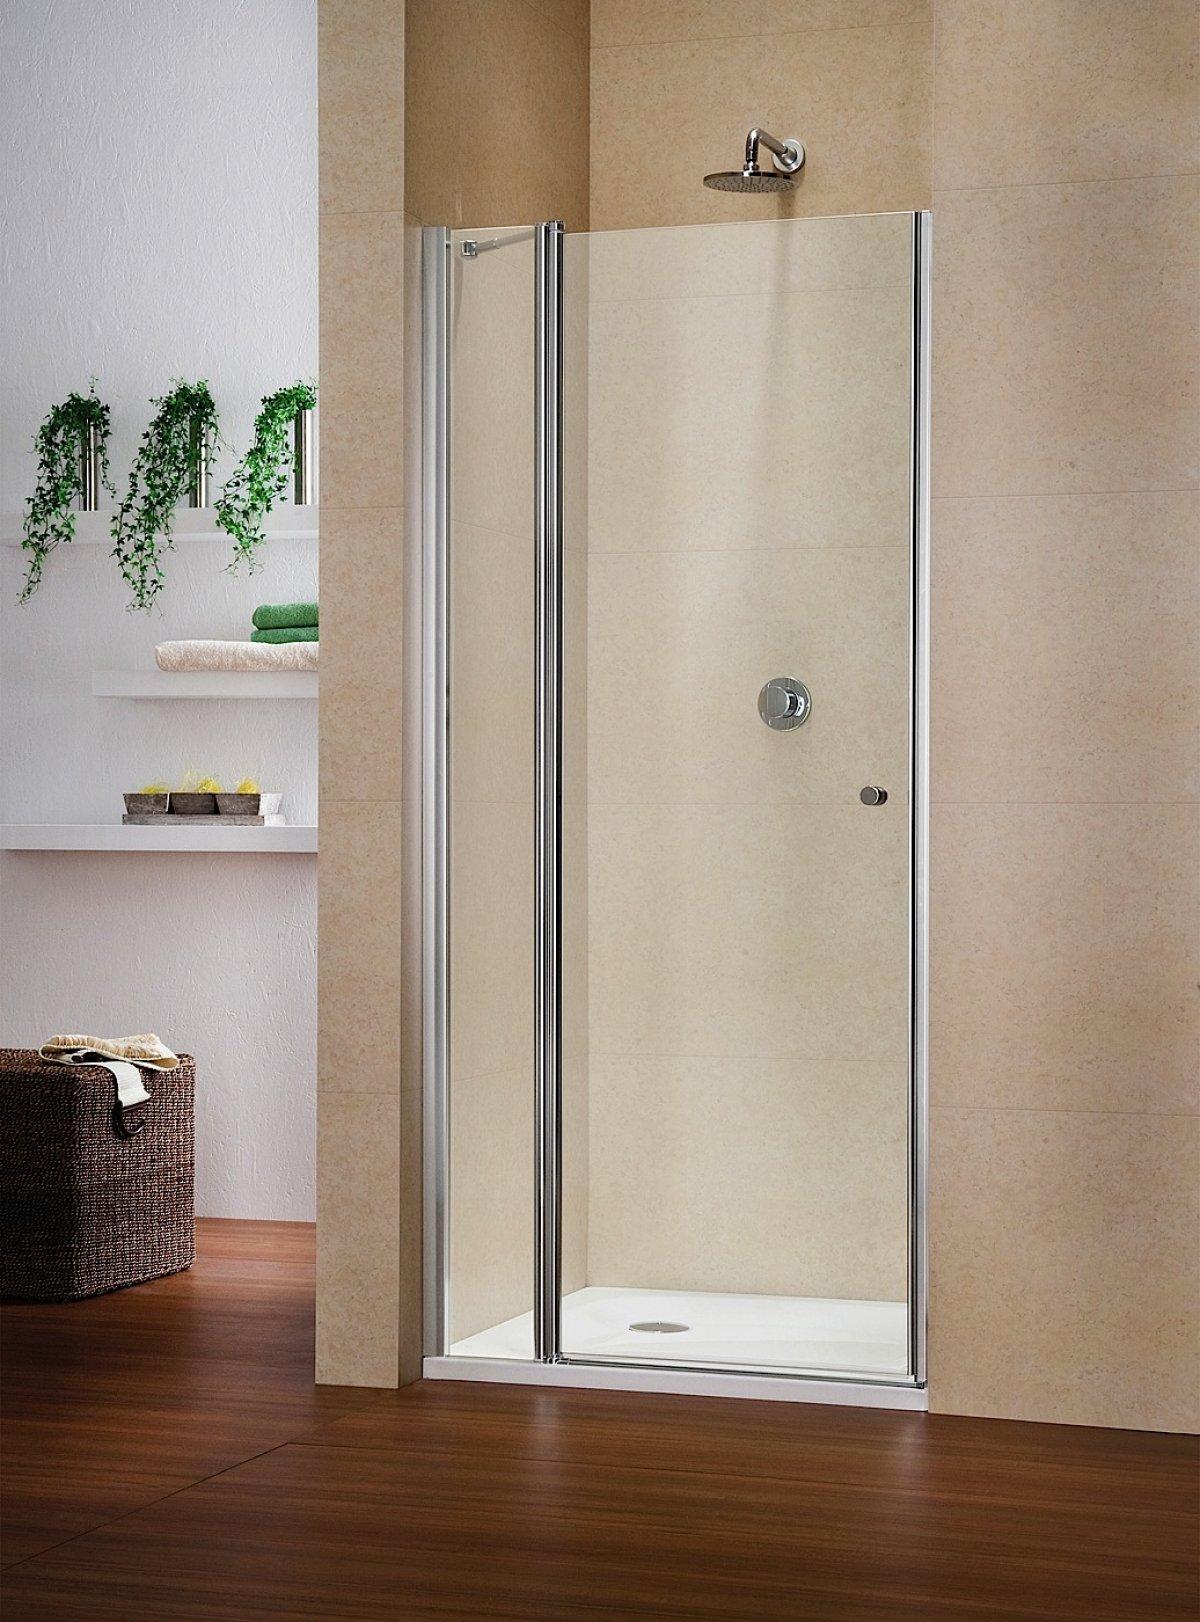 duscht r nische nischent r als duschabtrennung duka. Black Bedroom Furniture Sets. Home Design Ideas